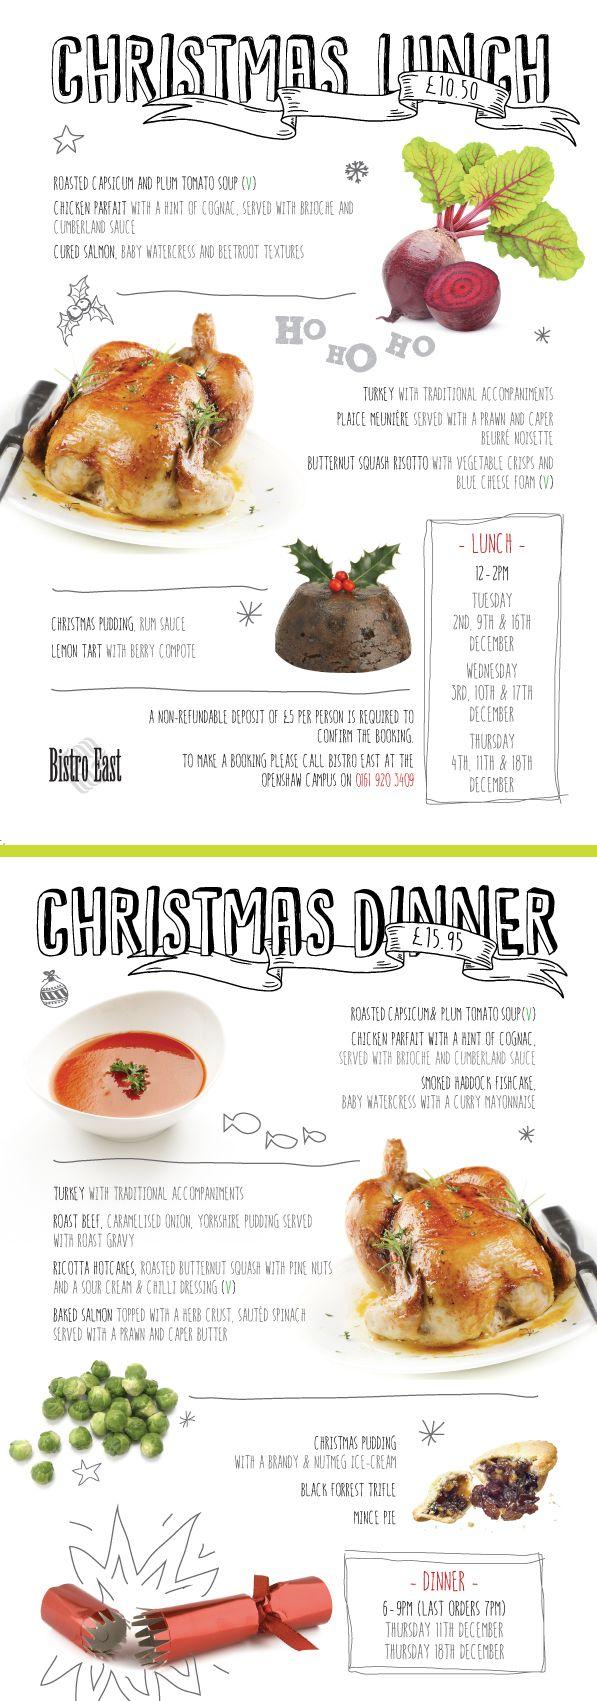 Christmas menu. Created by Sarah Cleworth